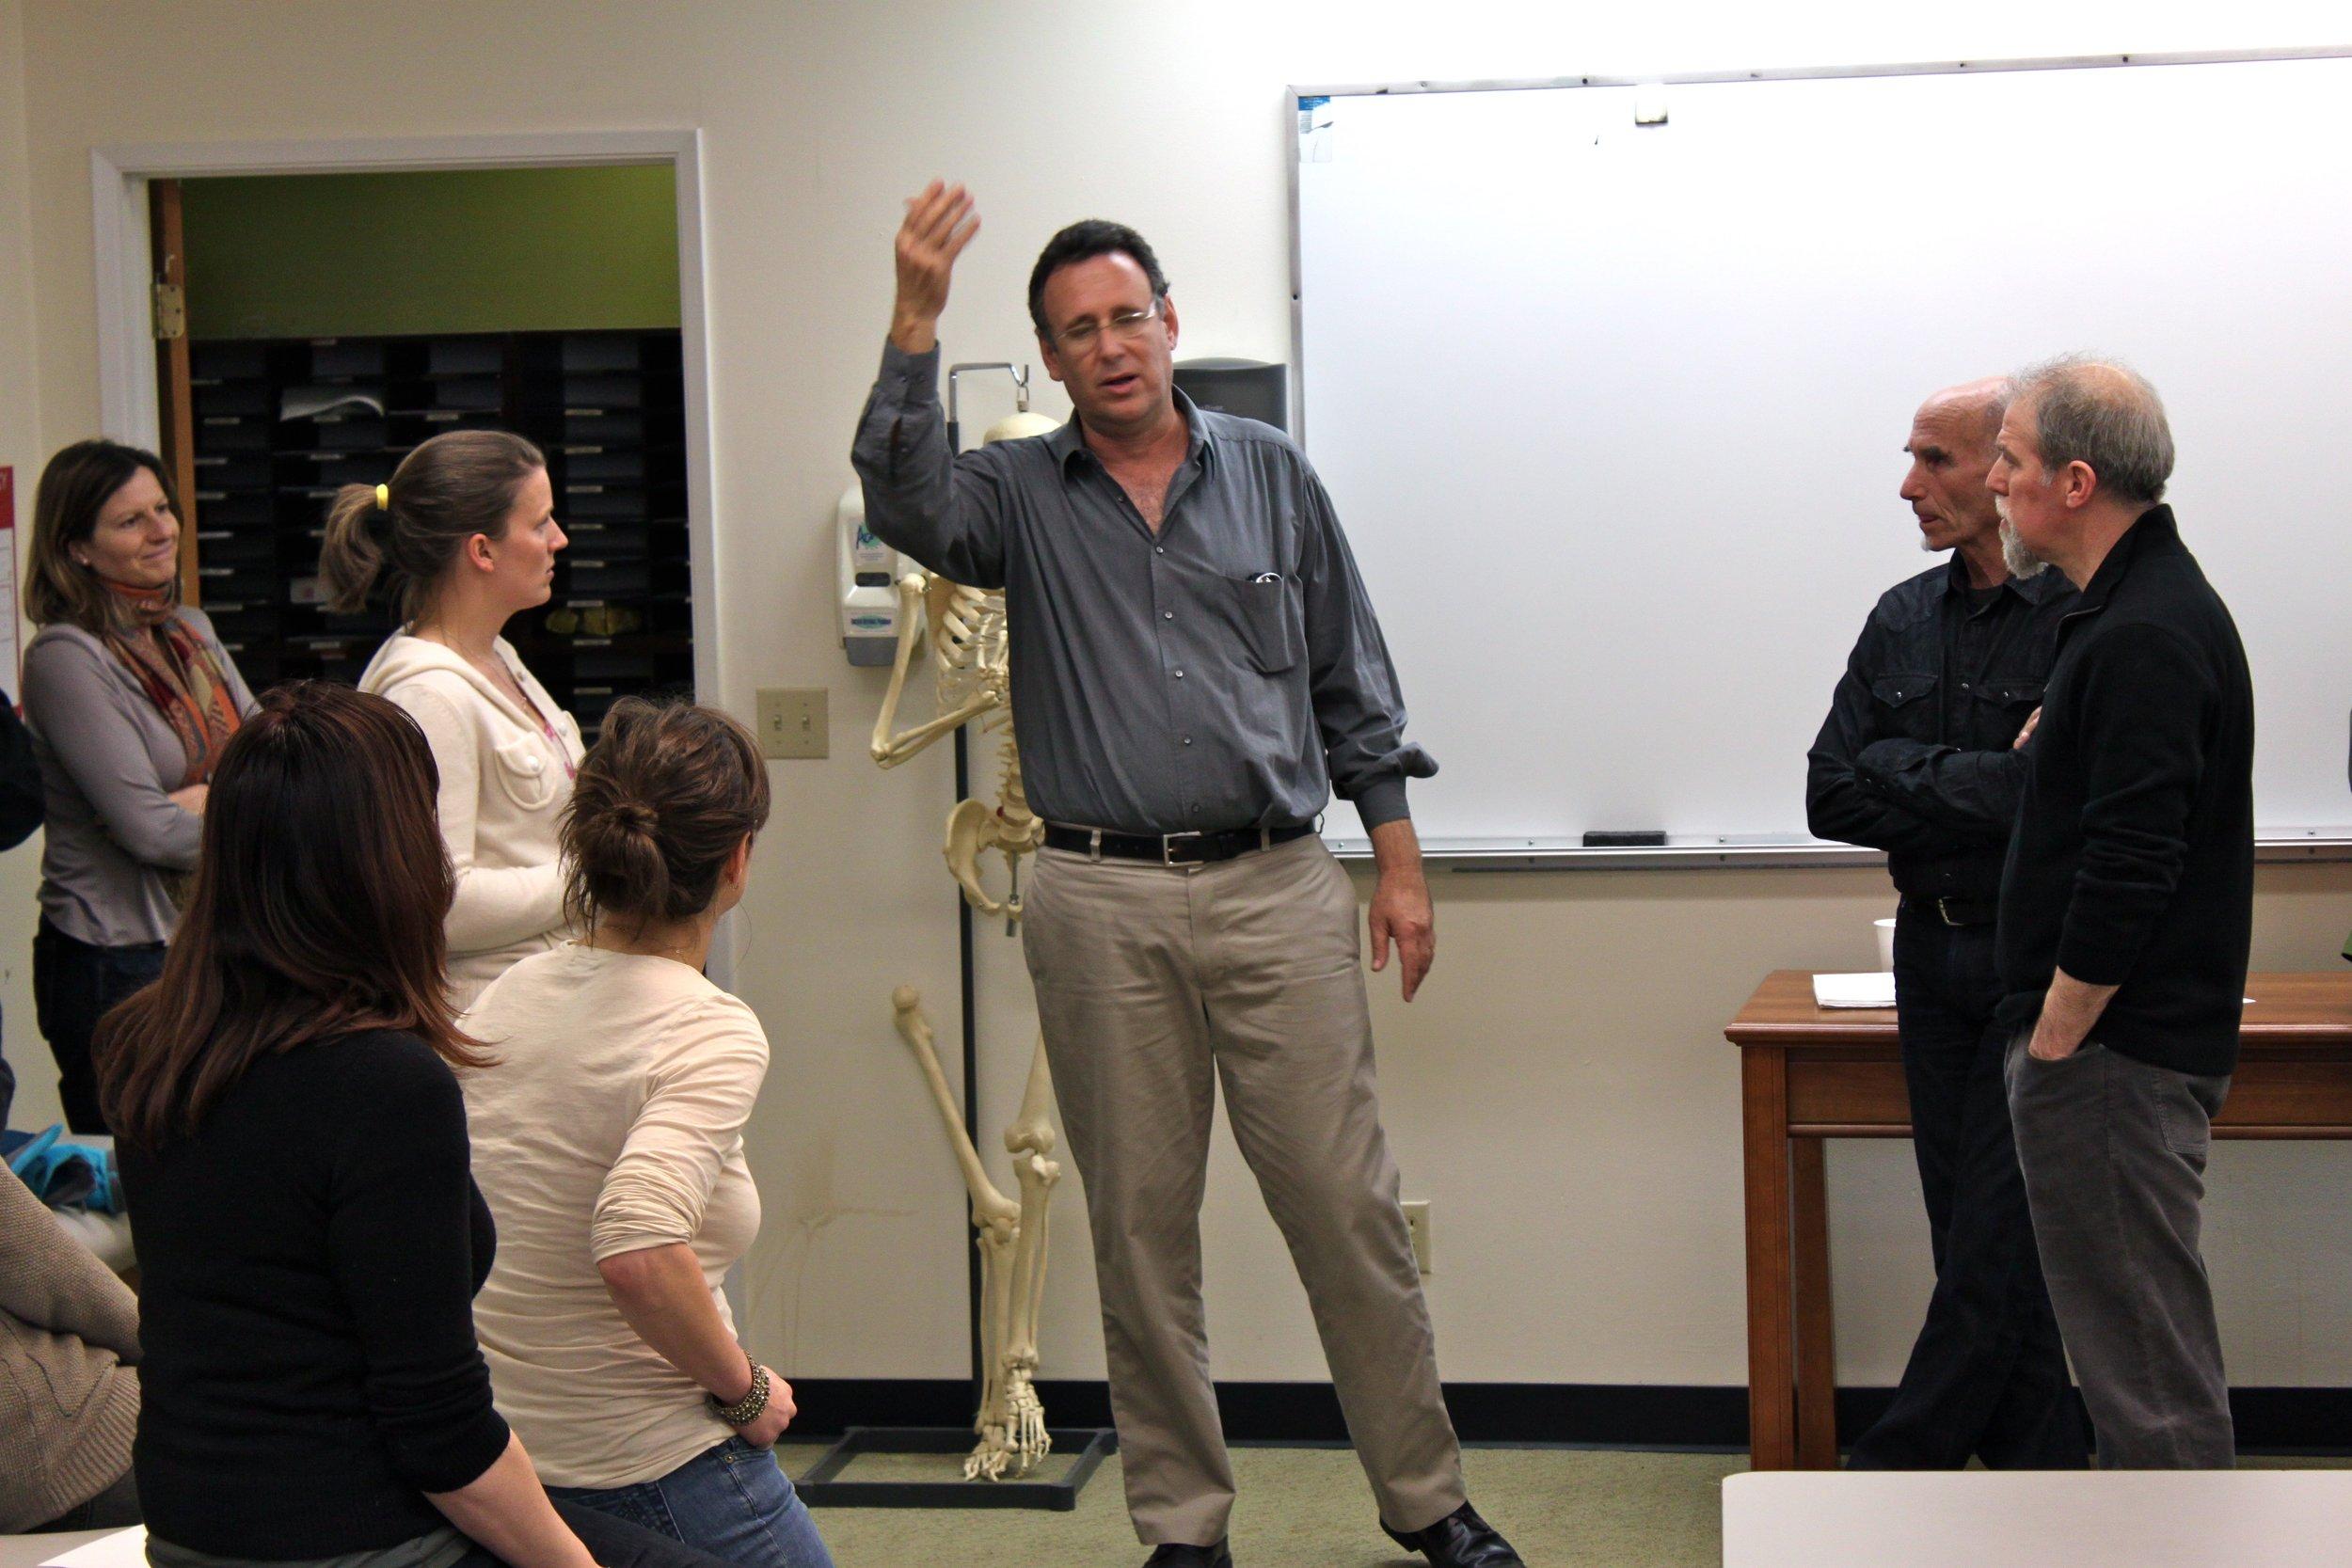 Dan teaching SF 3.jpg